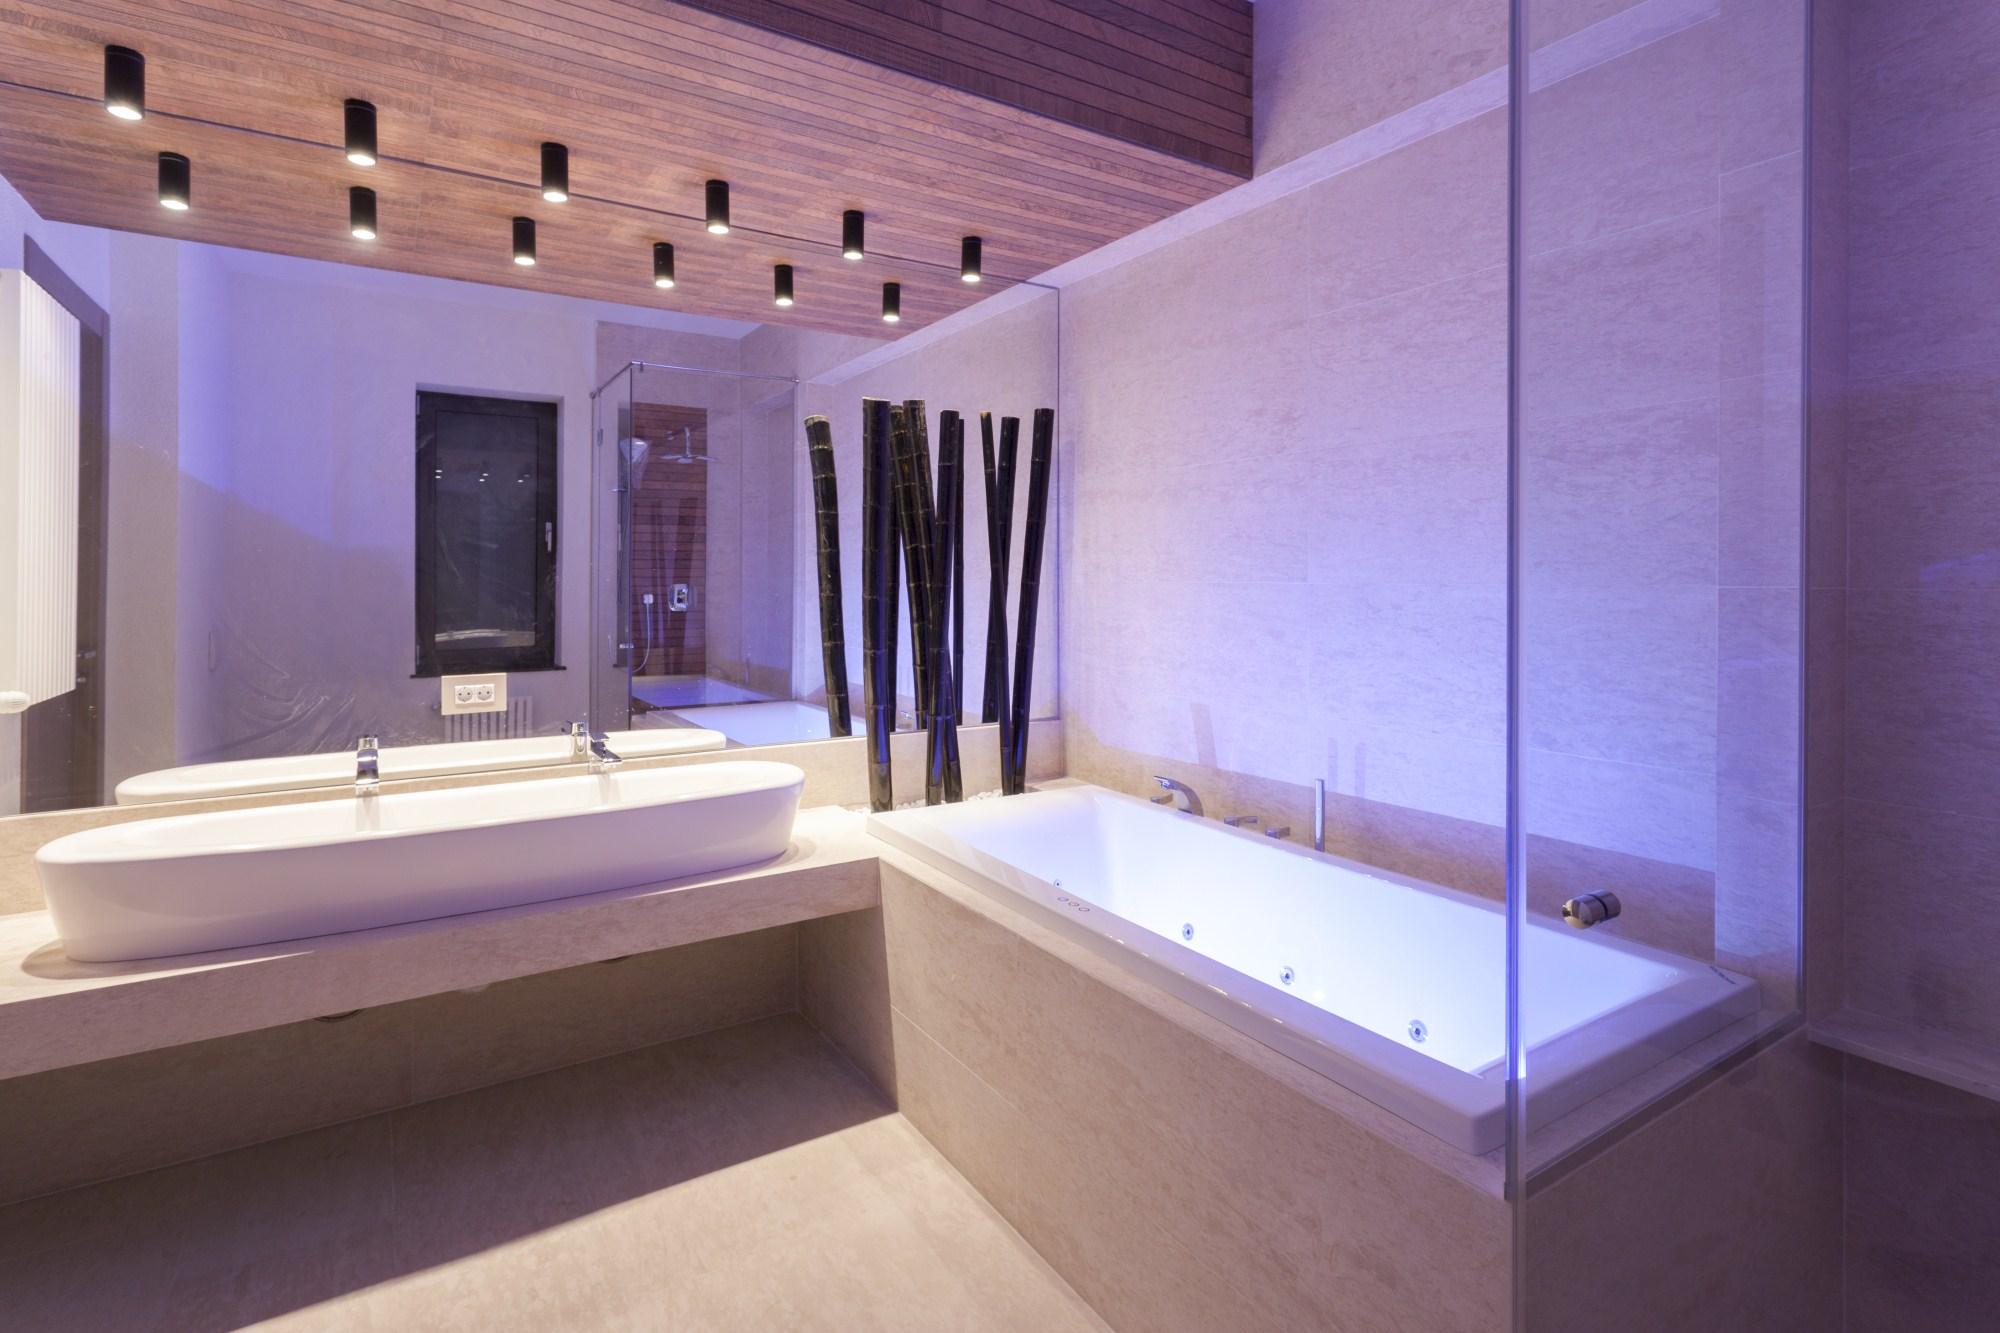 https://nbc-arhitect.ro/wp-content/uploads/2020/10/NBC-Arhitect-_-interiors-_-Vila-Pipera-_-Bucharest-Romania-_-interior-design-view_34.jpg